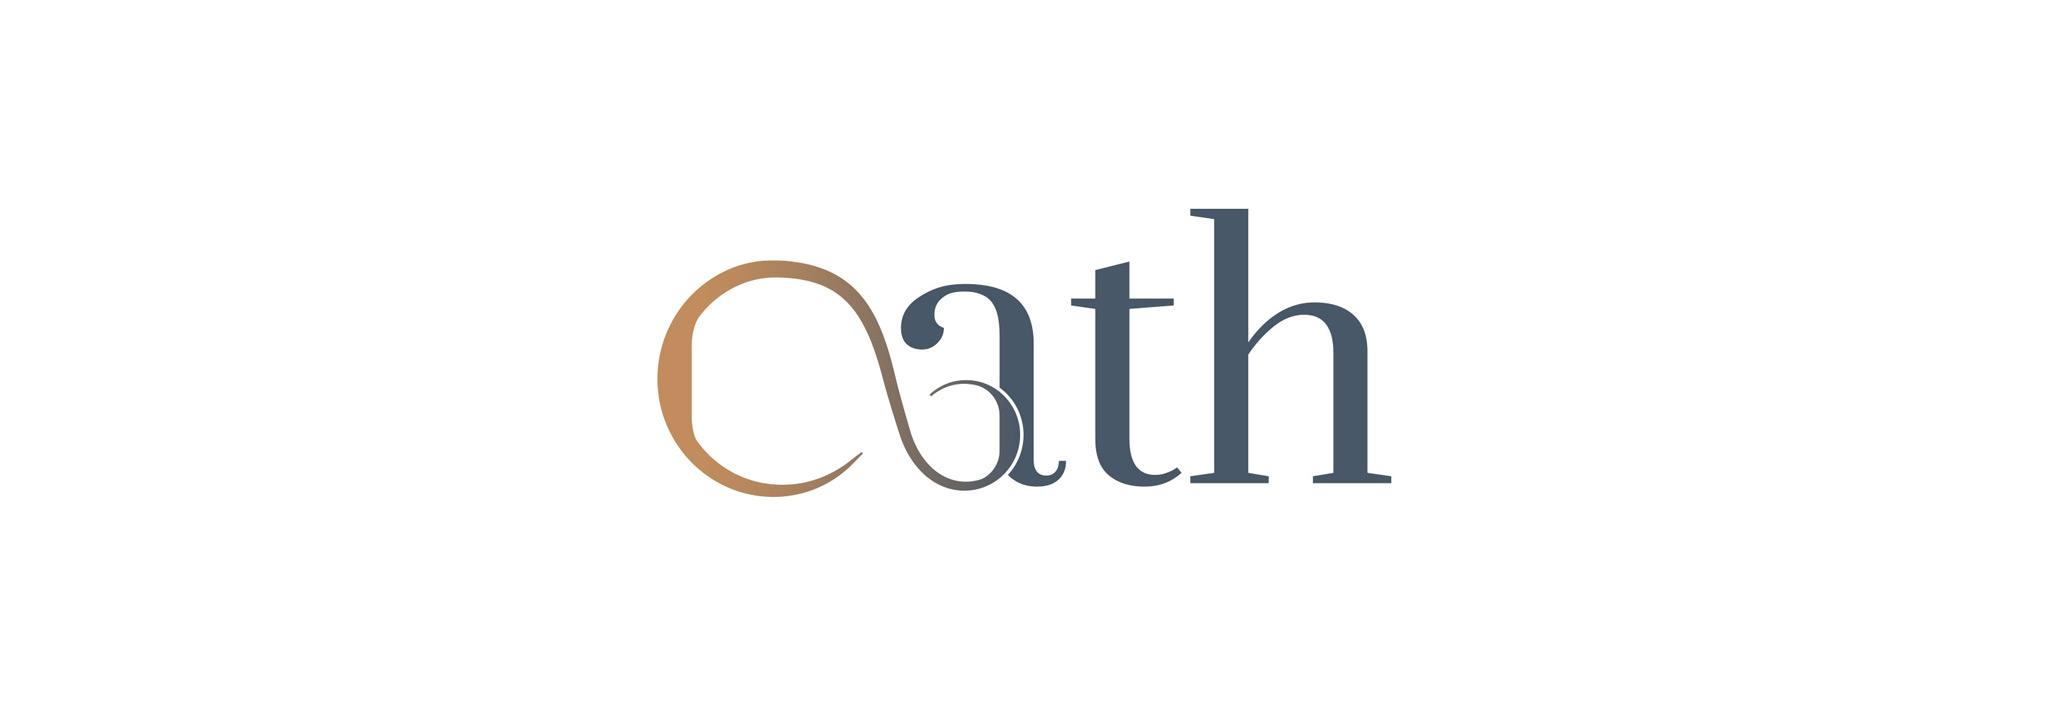 Oath cannabis insurance wordmark logo